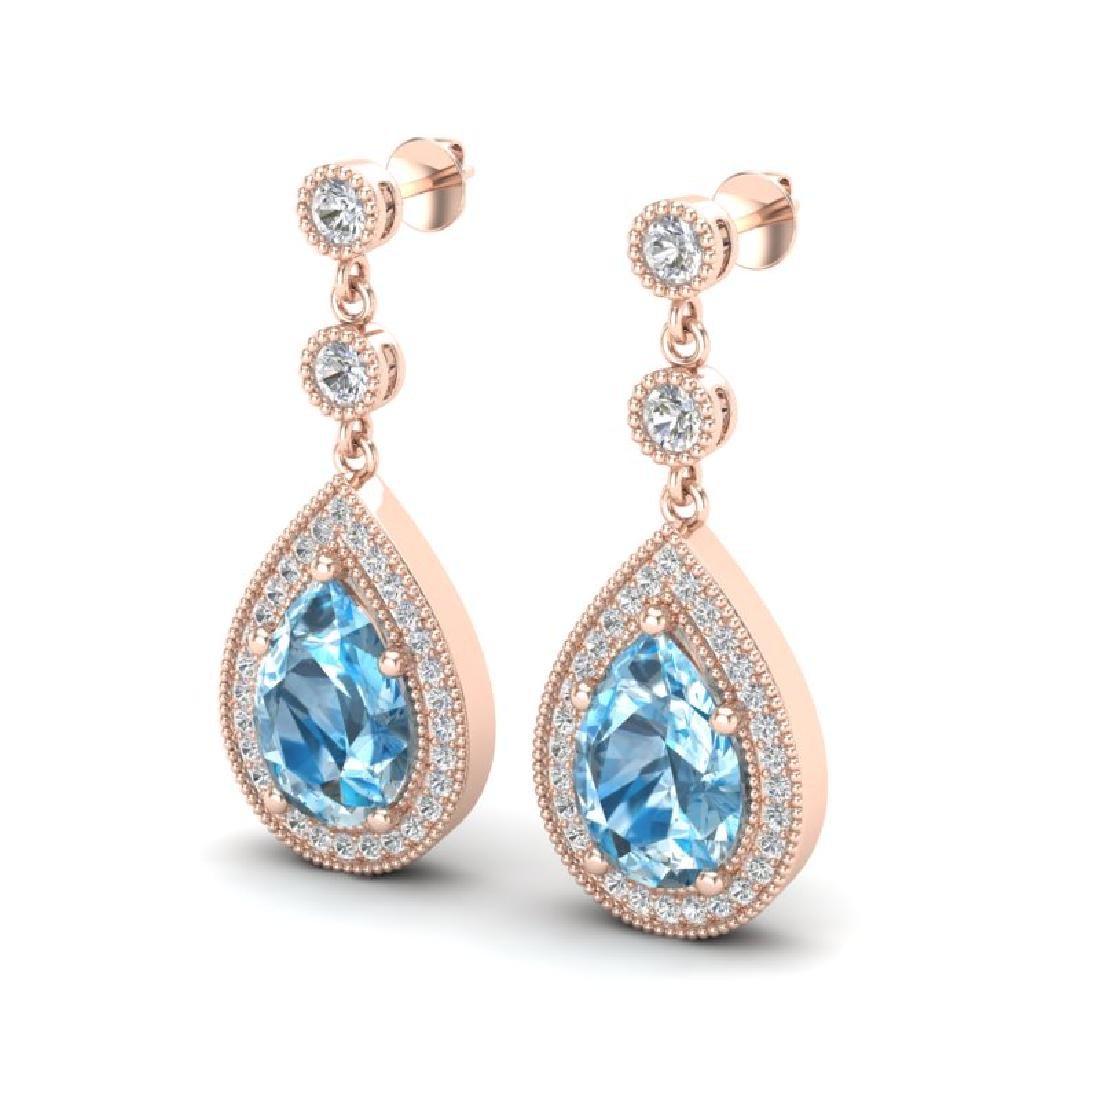 7.50 CTW Sky Topaz & Micro Pave VS/SI Diamond Earrings